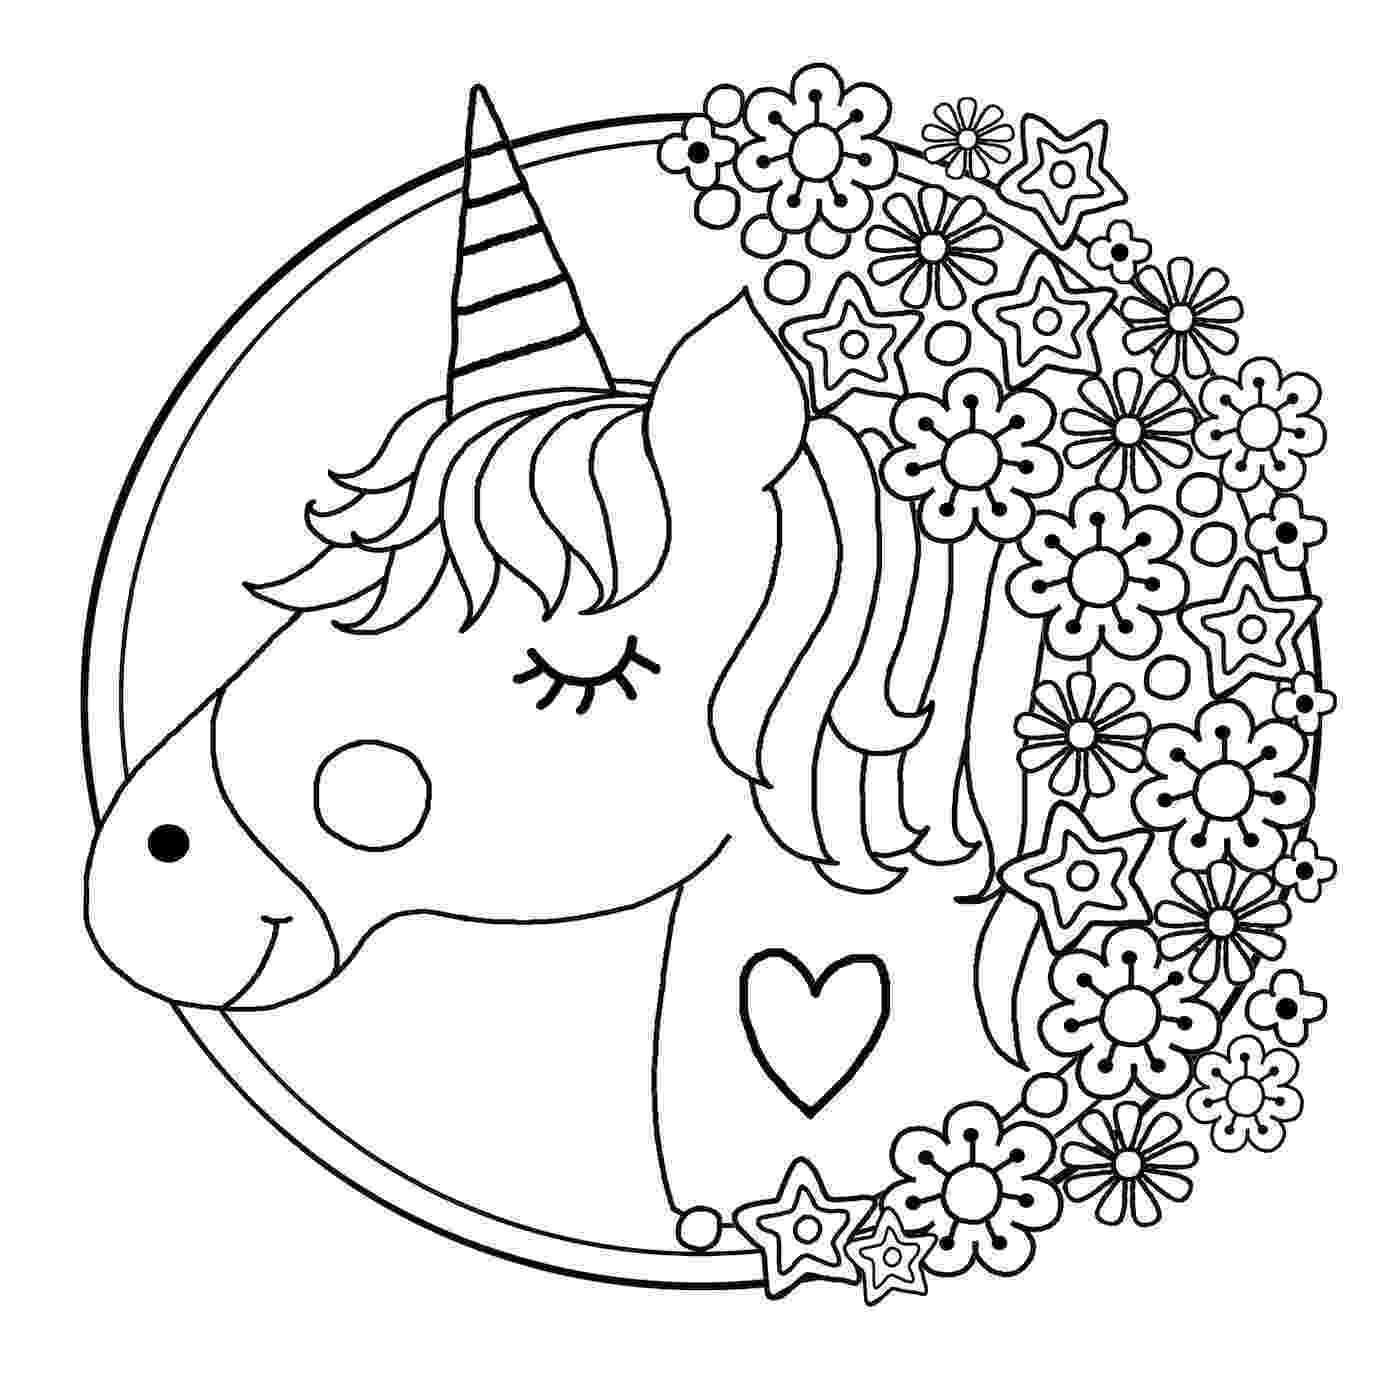 printable unicorn transmissionpress free printable unicorn coloring pages kids printable unicorn